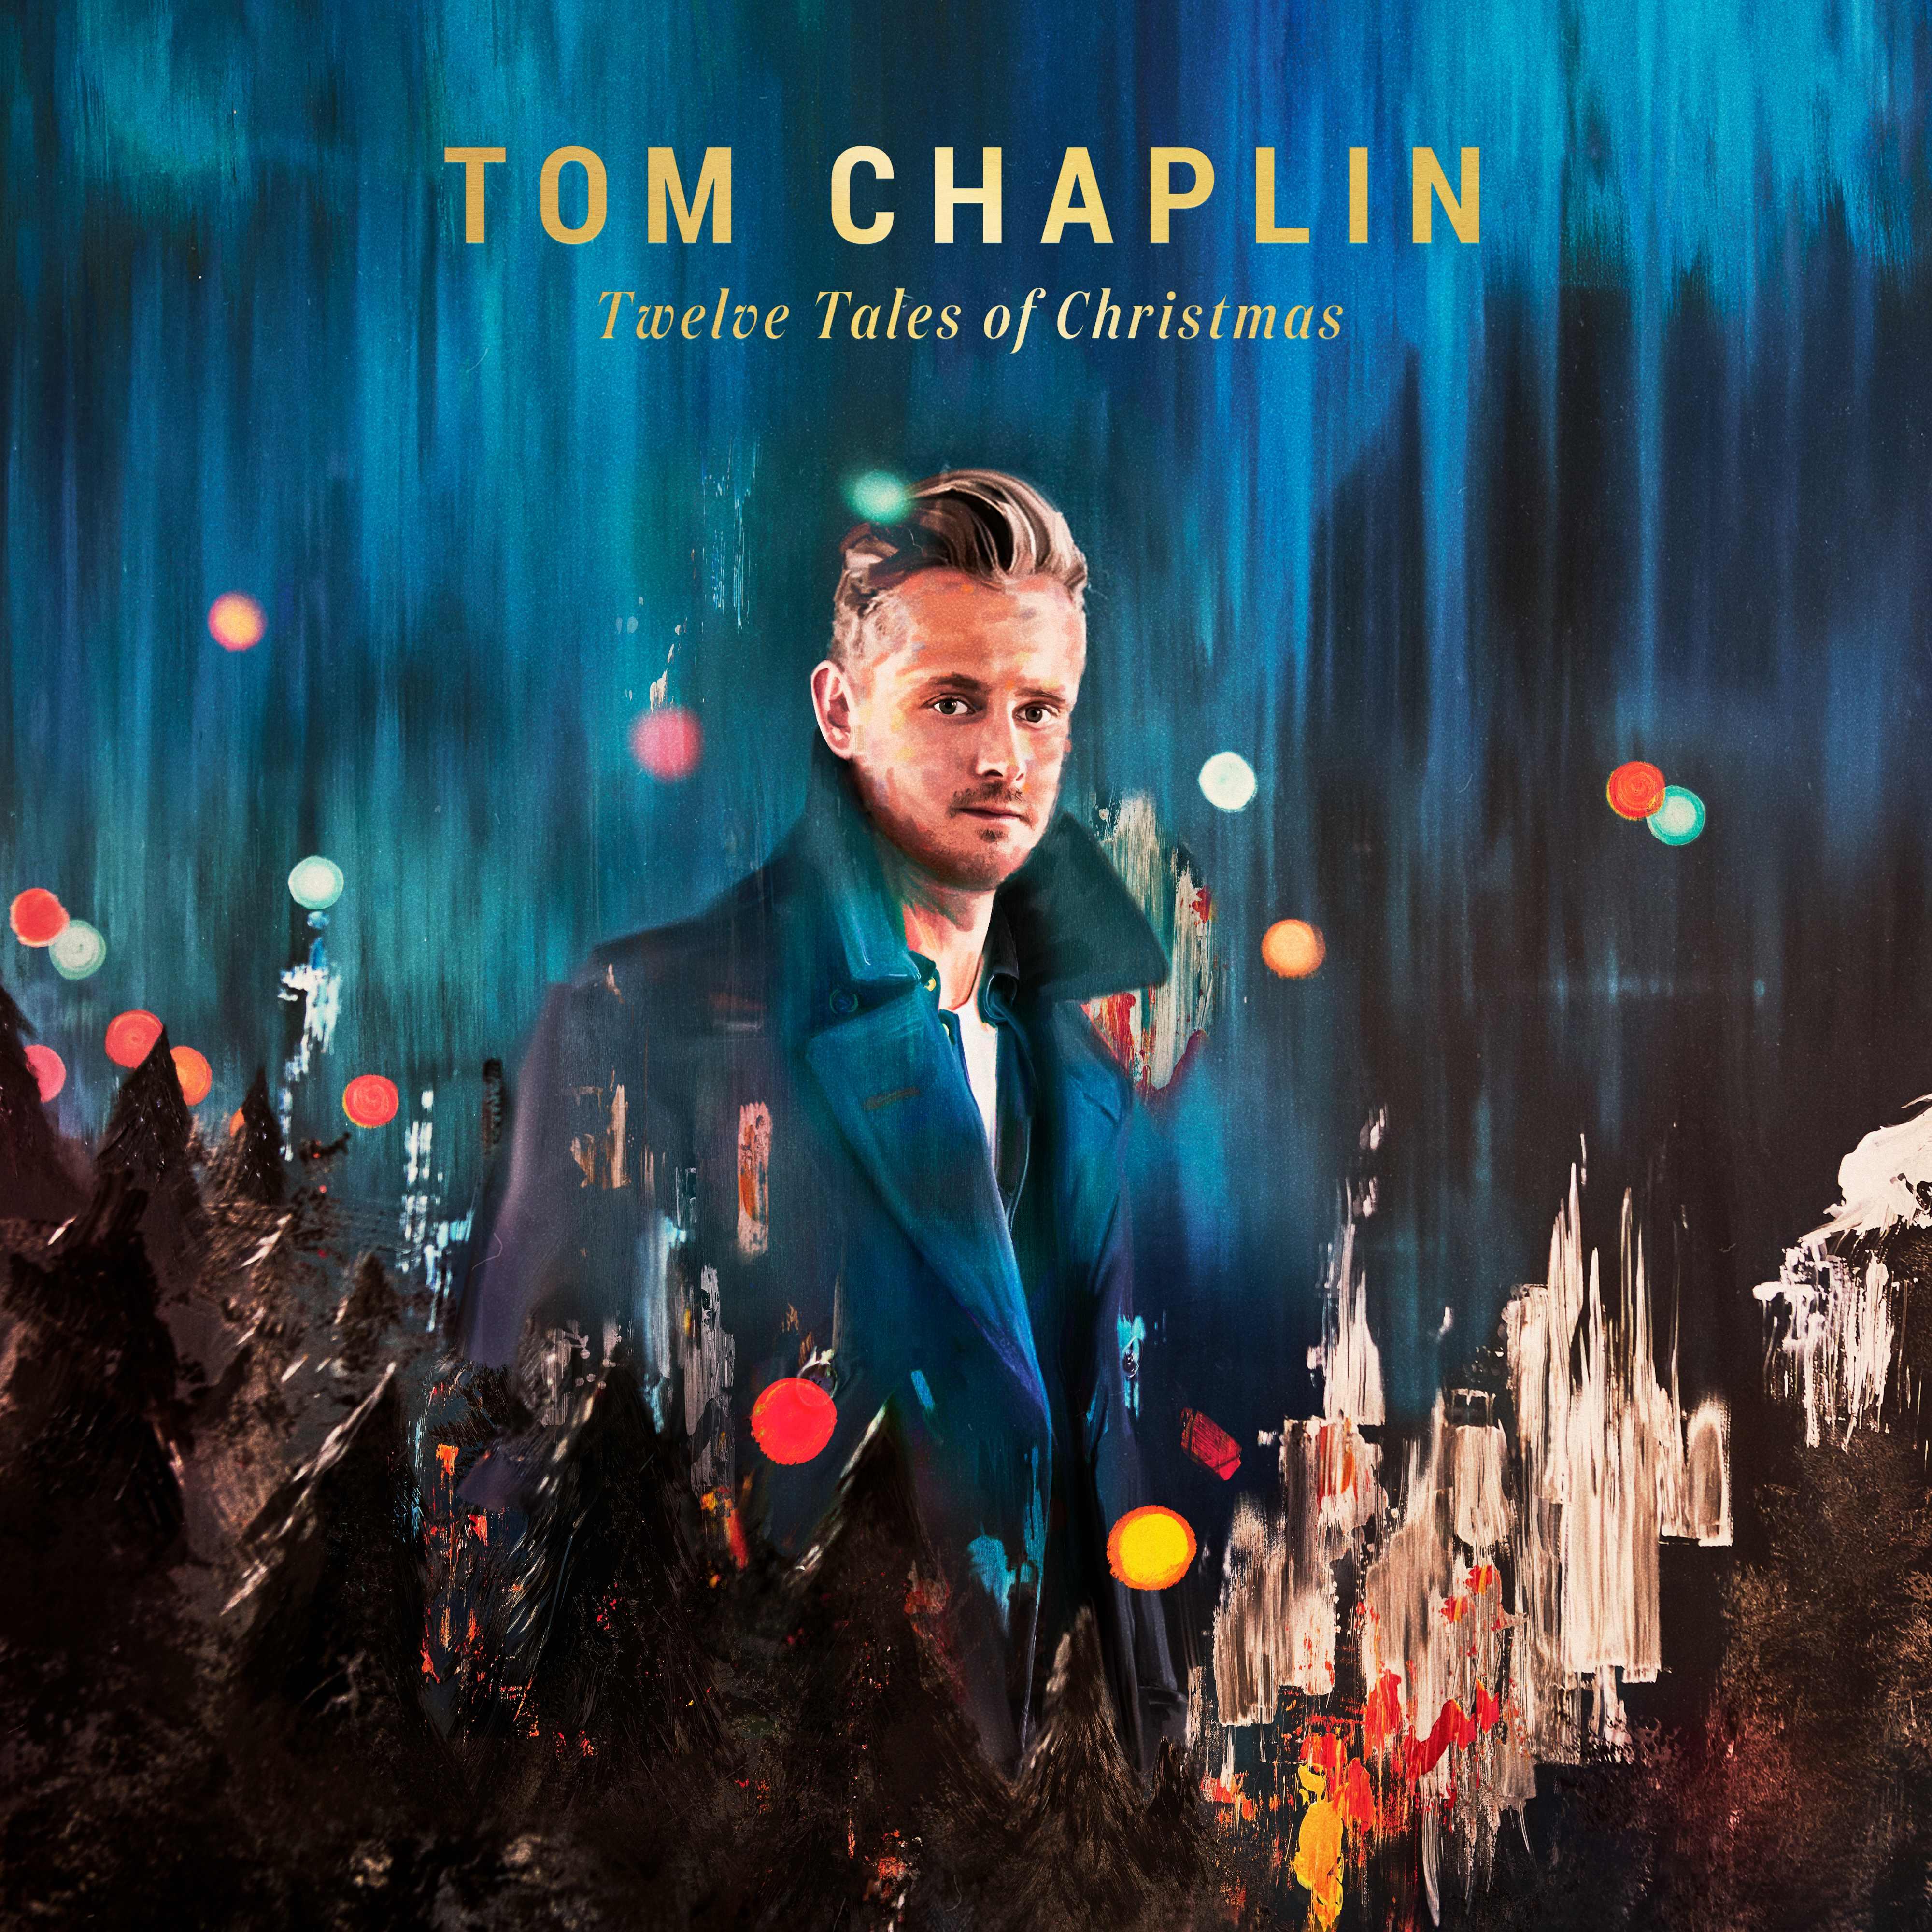 Tom Chaplin album